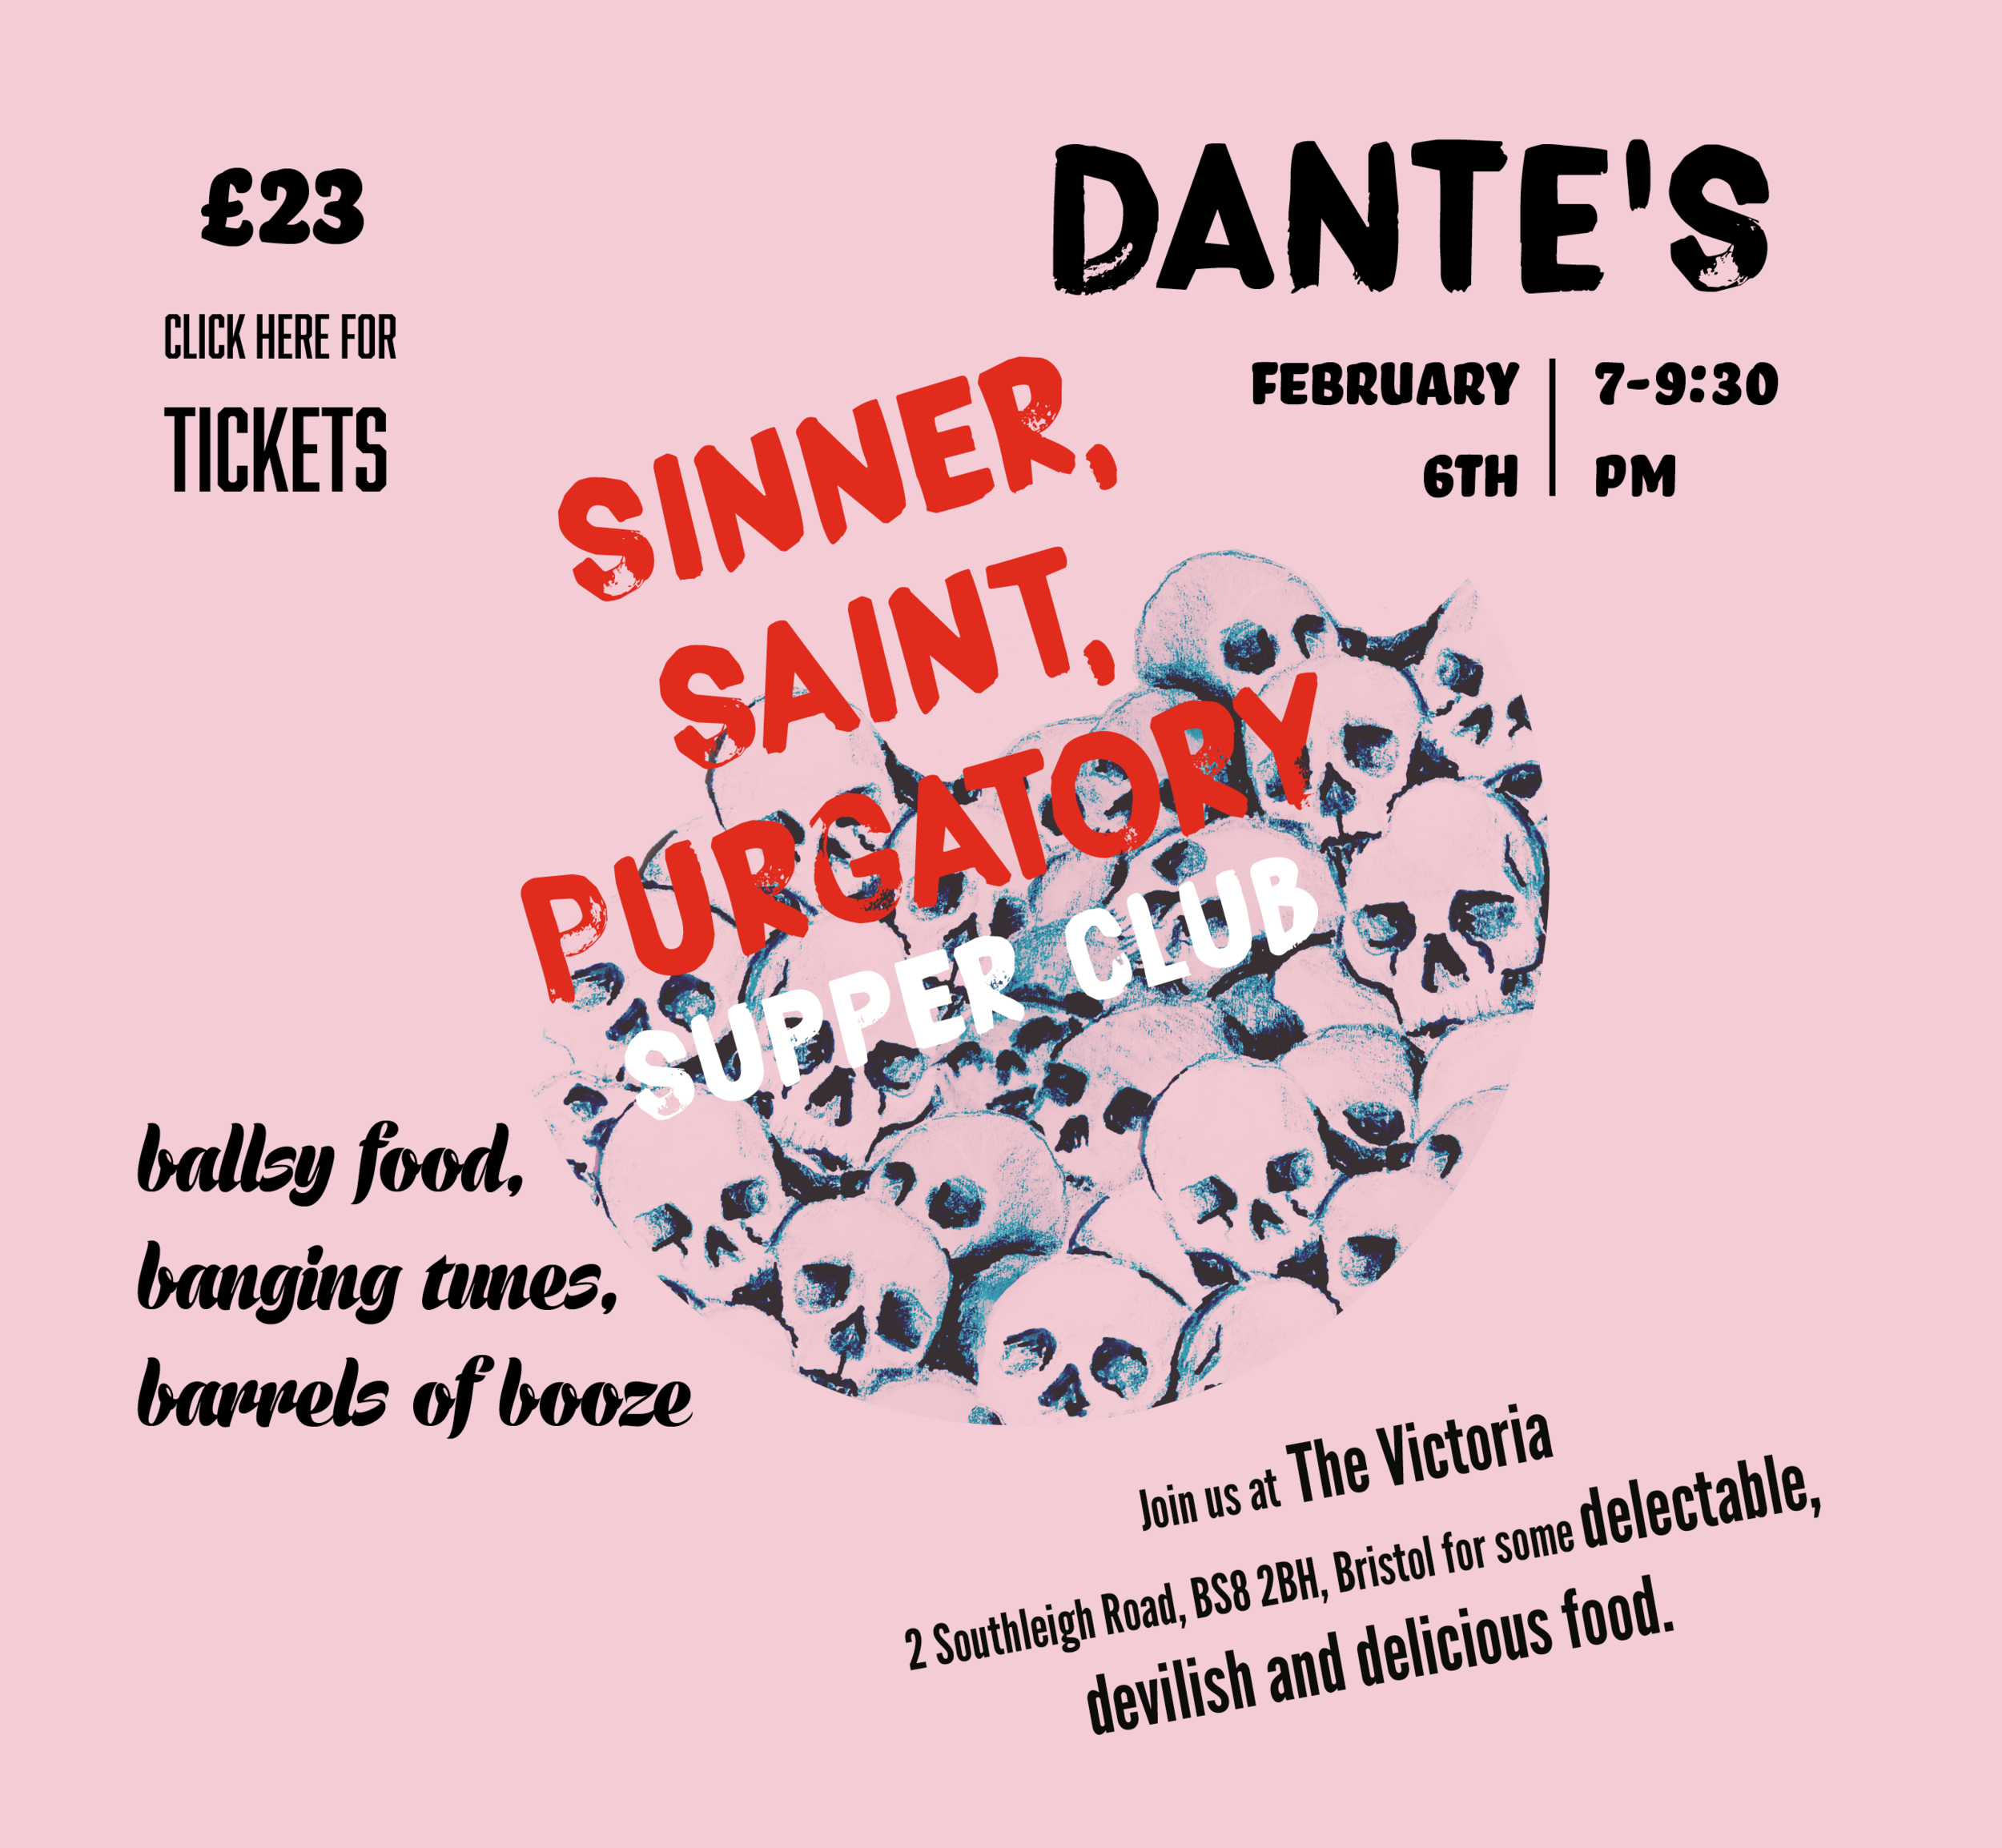 SINNER, SAINT, PURGATORY - SUPPER CLUB @ THE VICTORIA PUB 6TH FEBRUARY